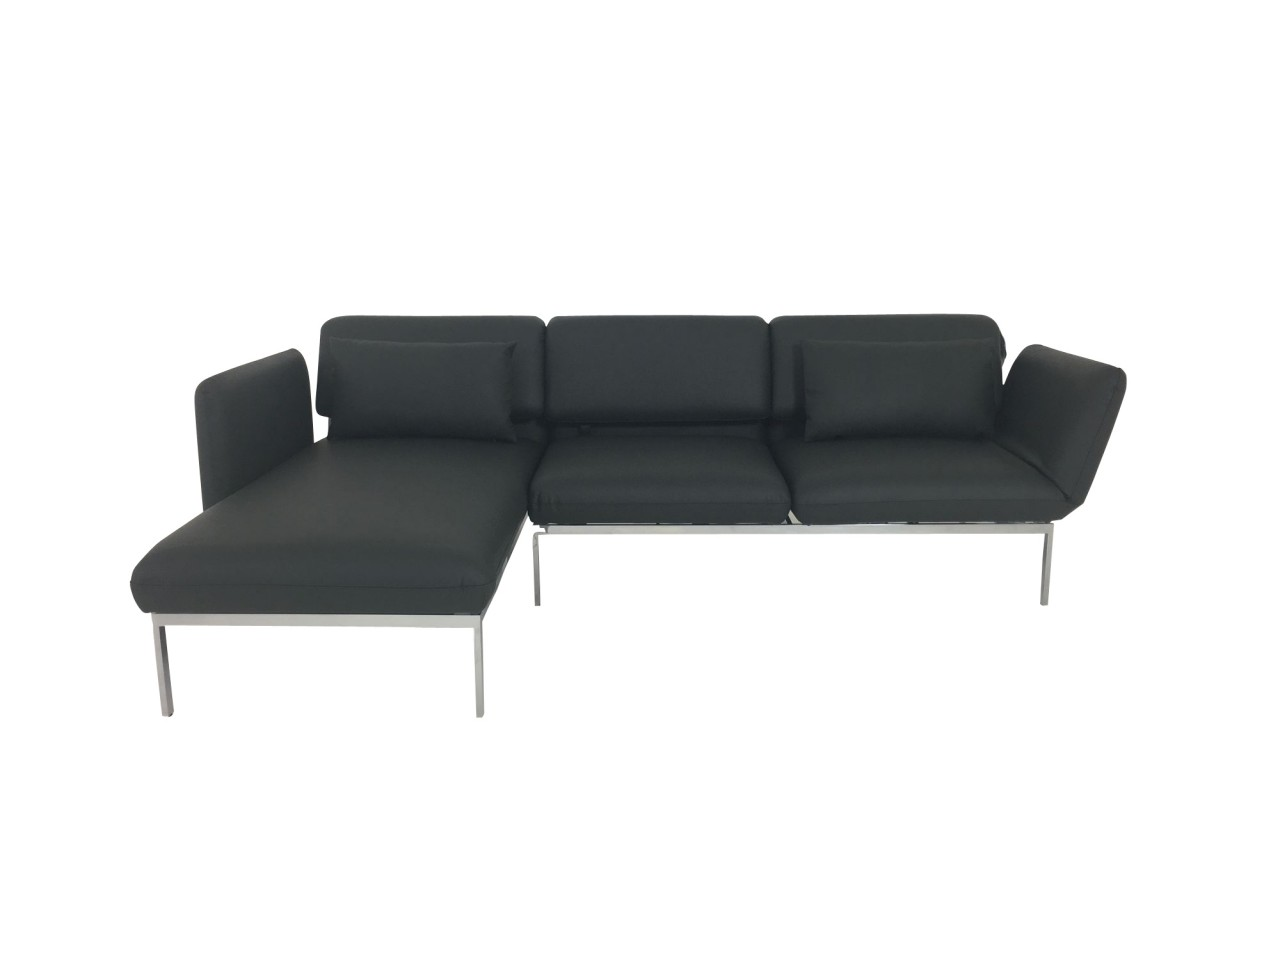 Brühl RORO medium Sofa mit Recamiere links in Leder dunkelgrau mit Drehsitz